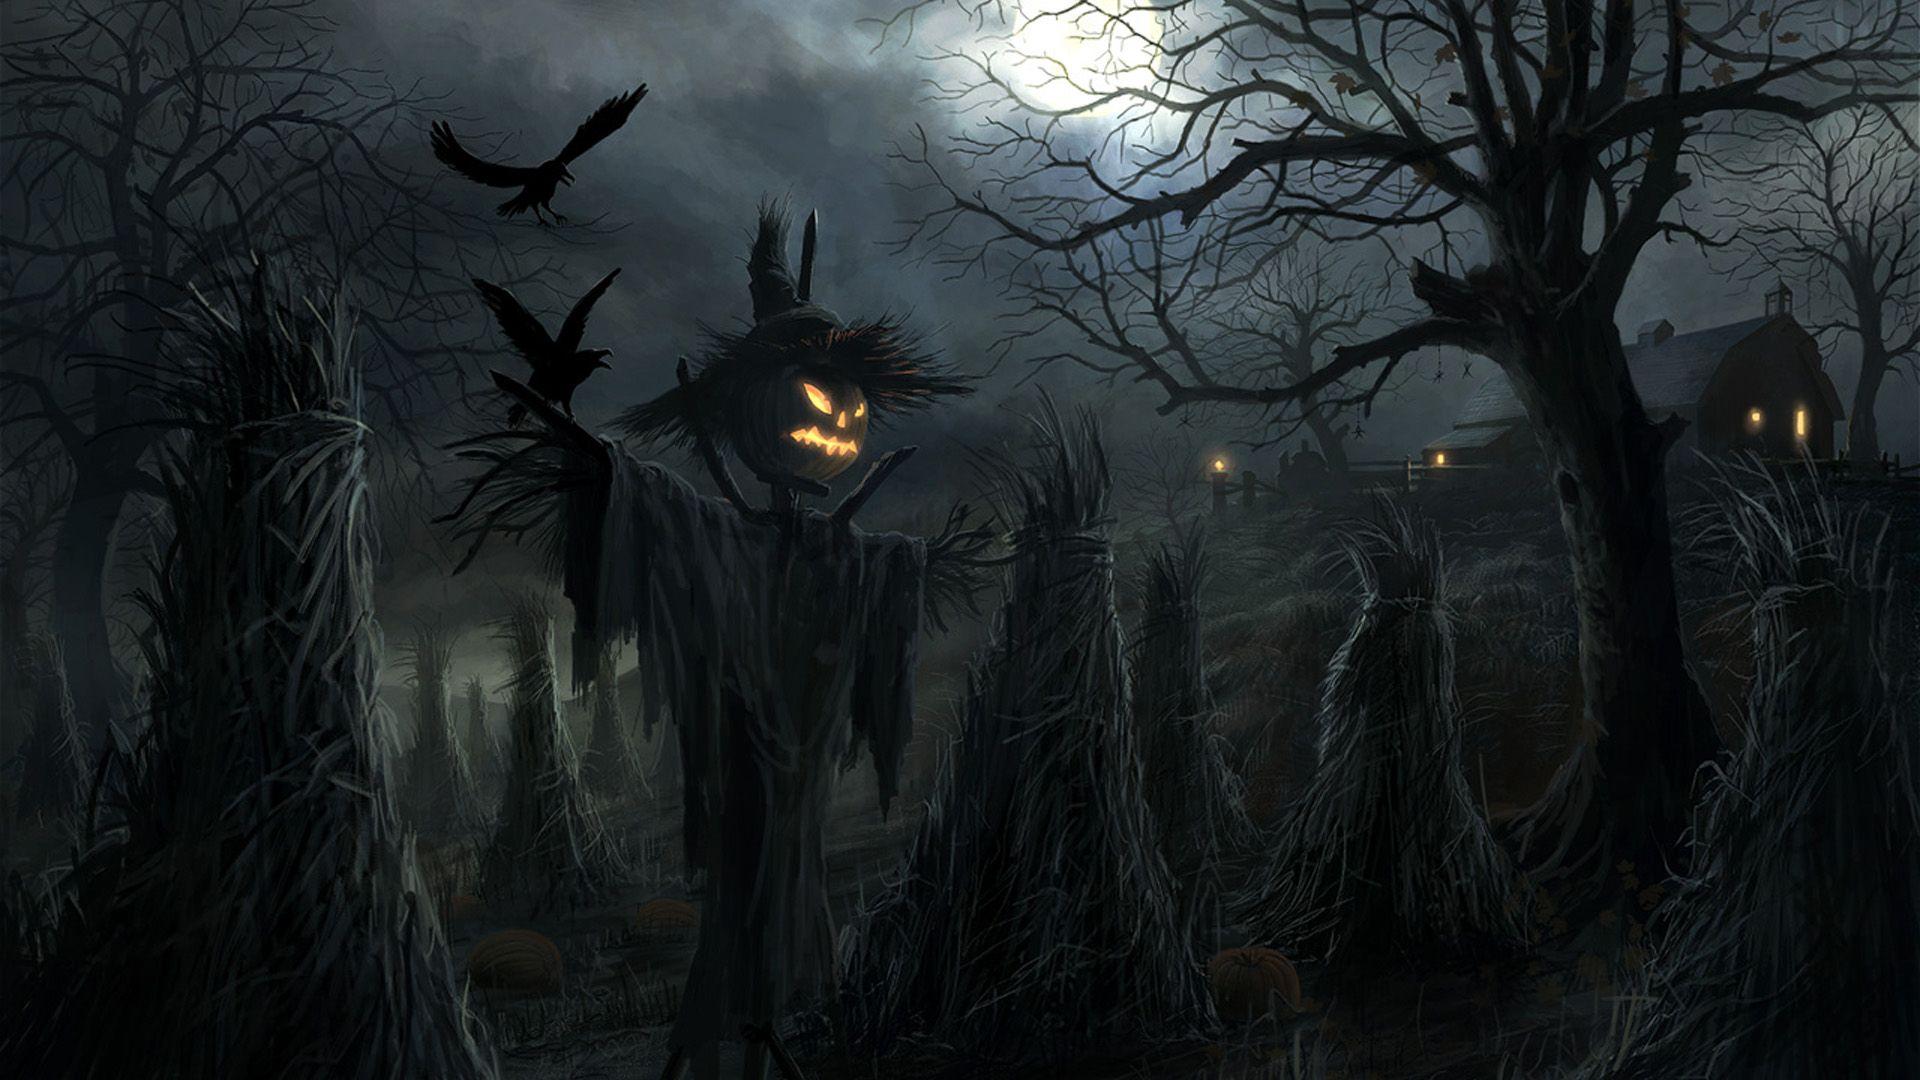 Popular Wallpaper High Quality Halloween - c5a50ede24949980888cb9e7674d604d  Pic_549399.jpg